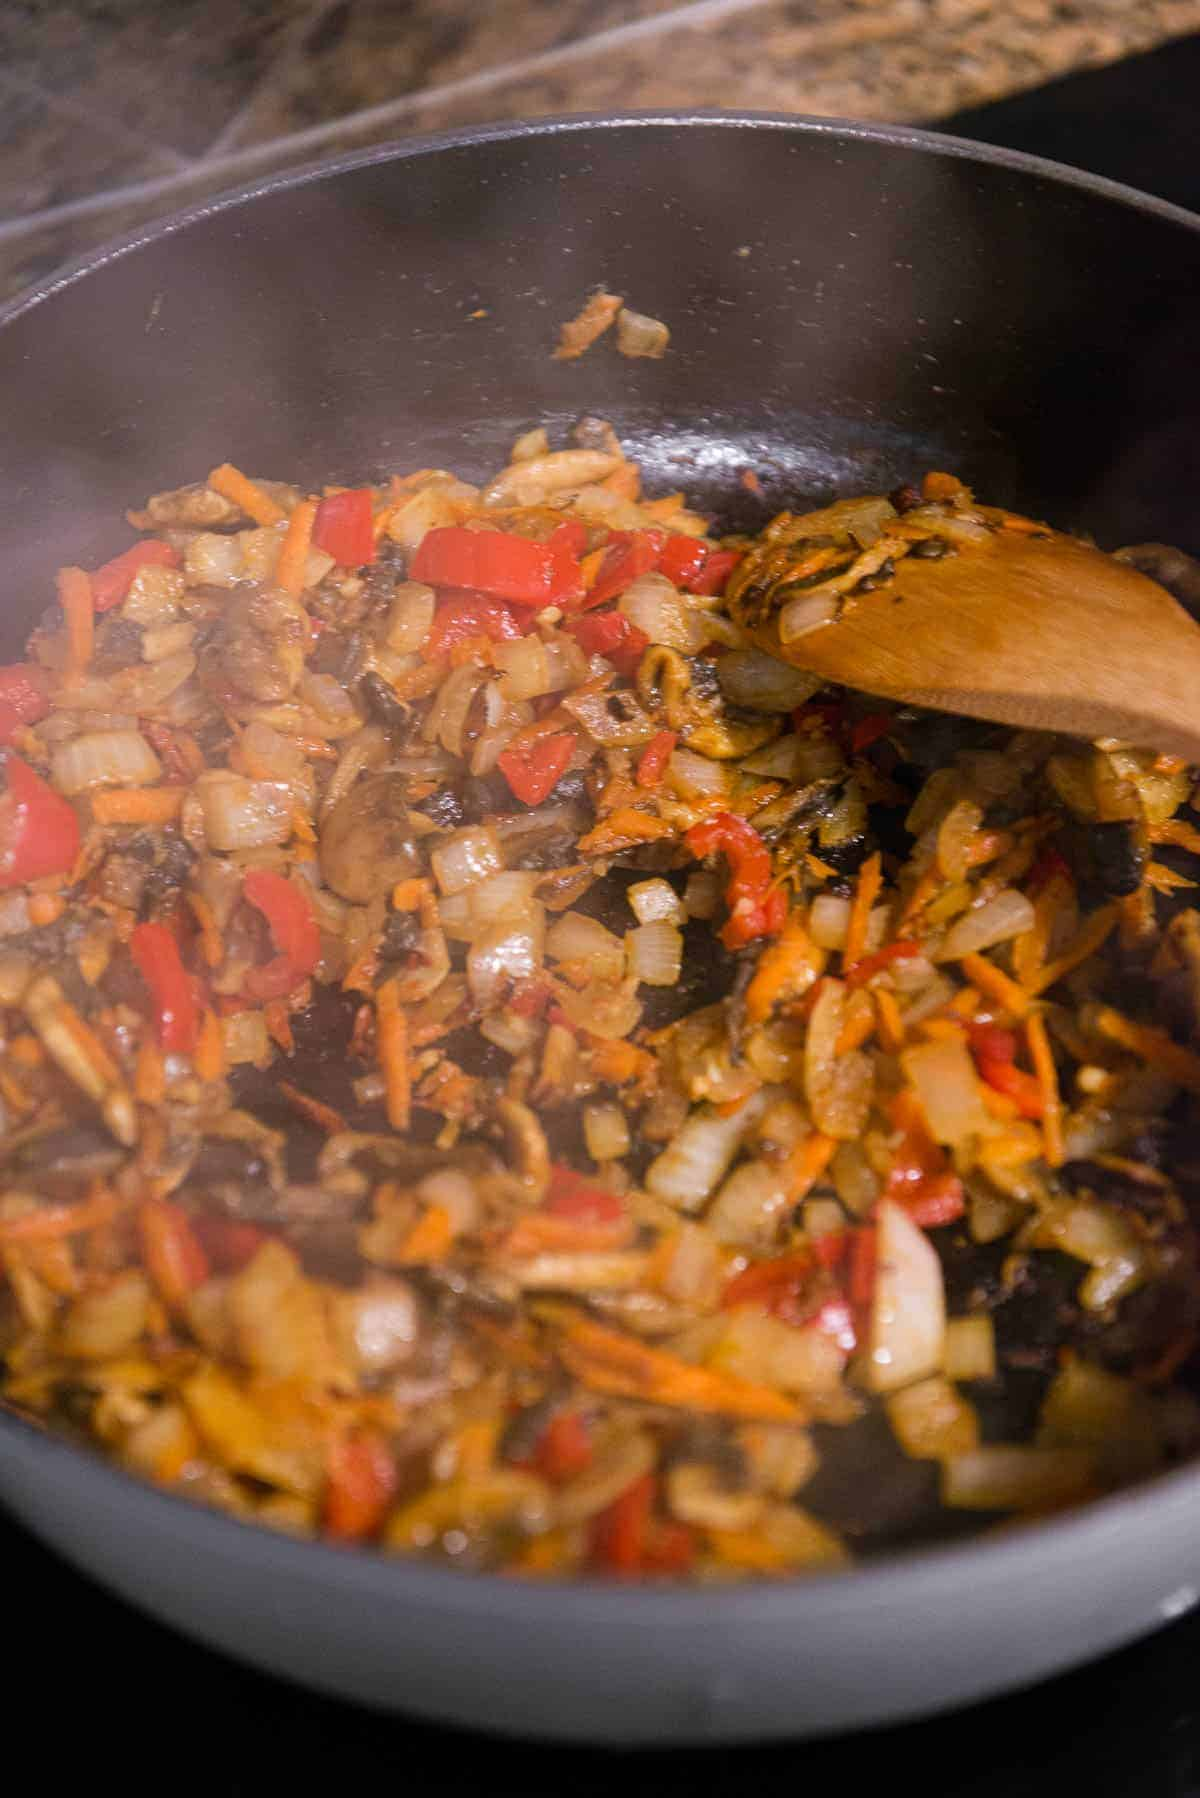 stirring diced vegetables for Chicken Cacciatore recipe